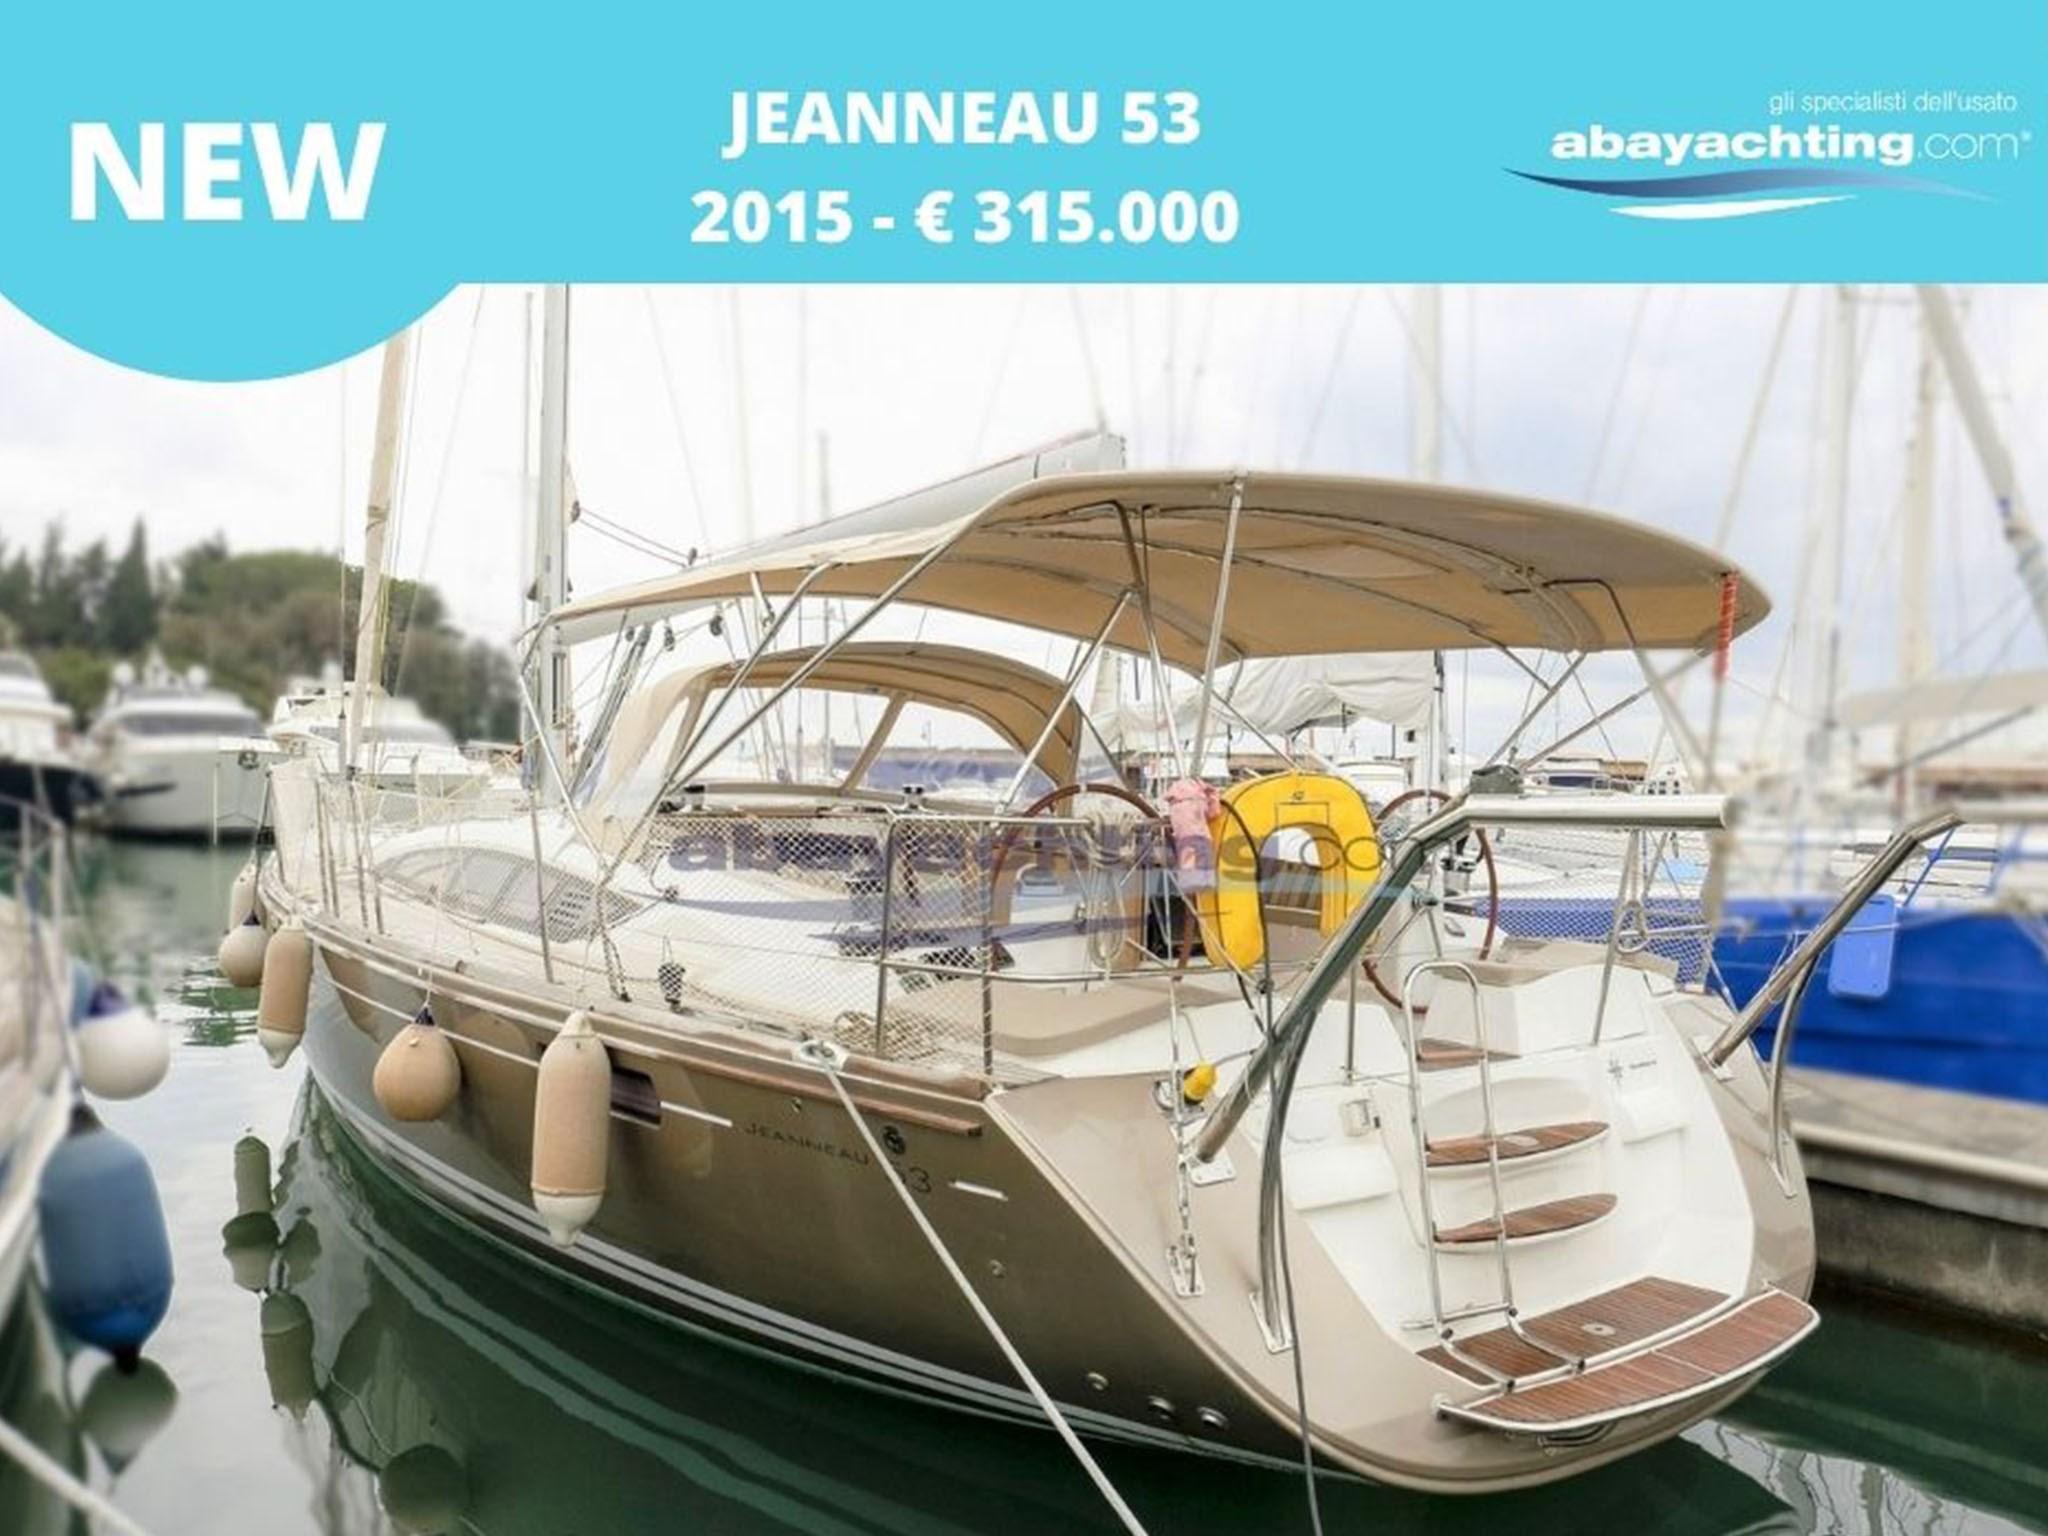 New arrival Jeanneau 53